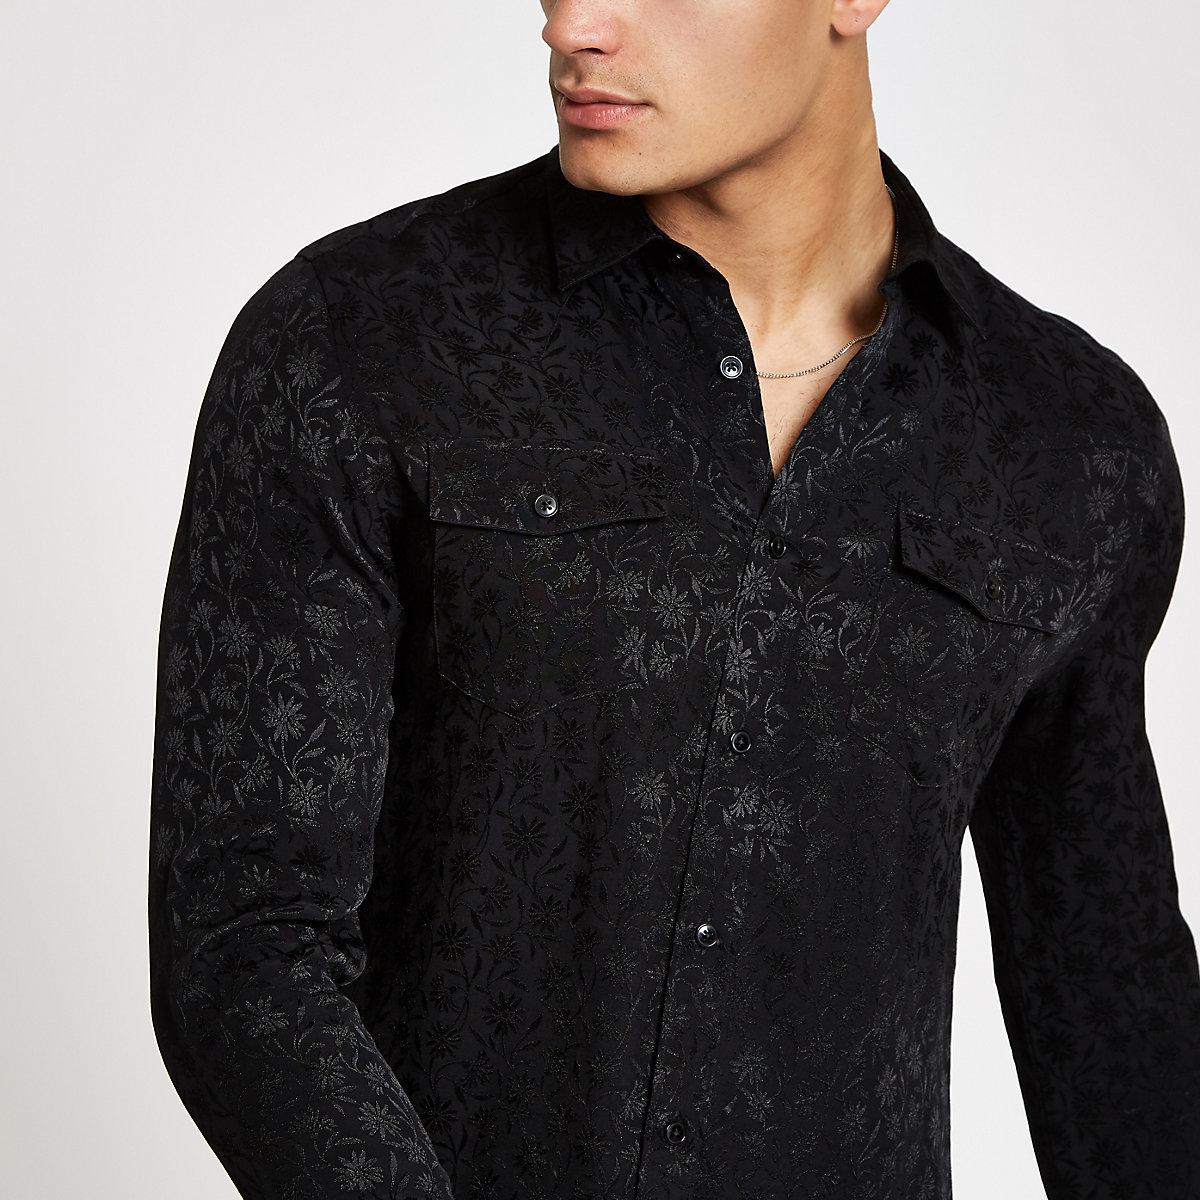 Black jacquard button-down shirt